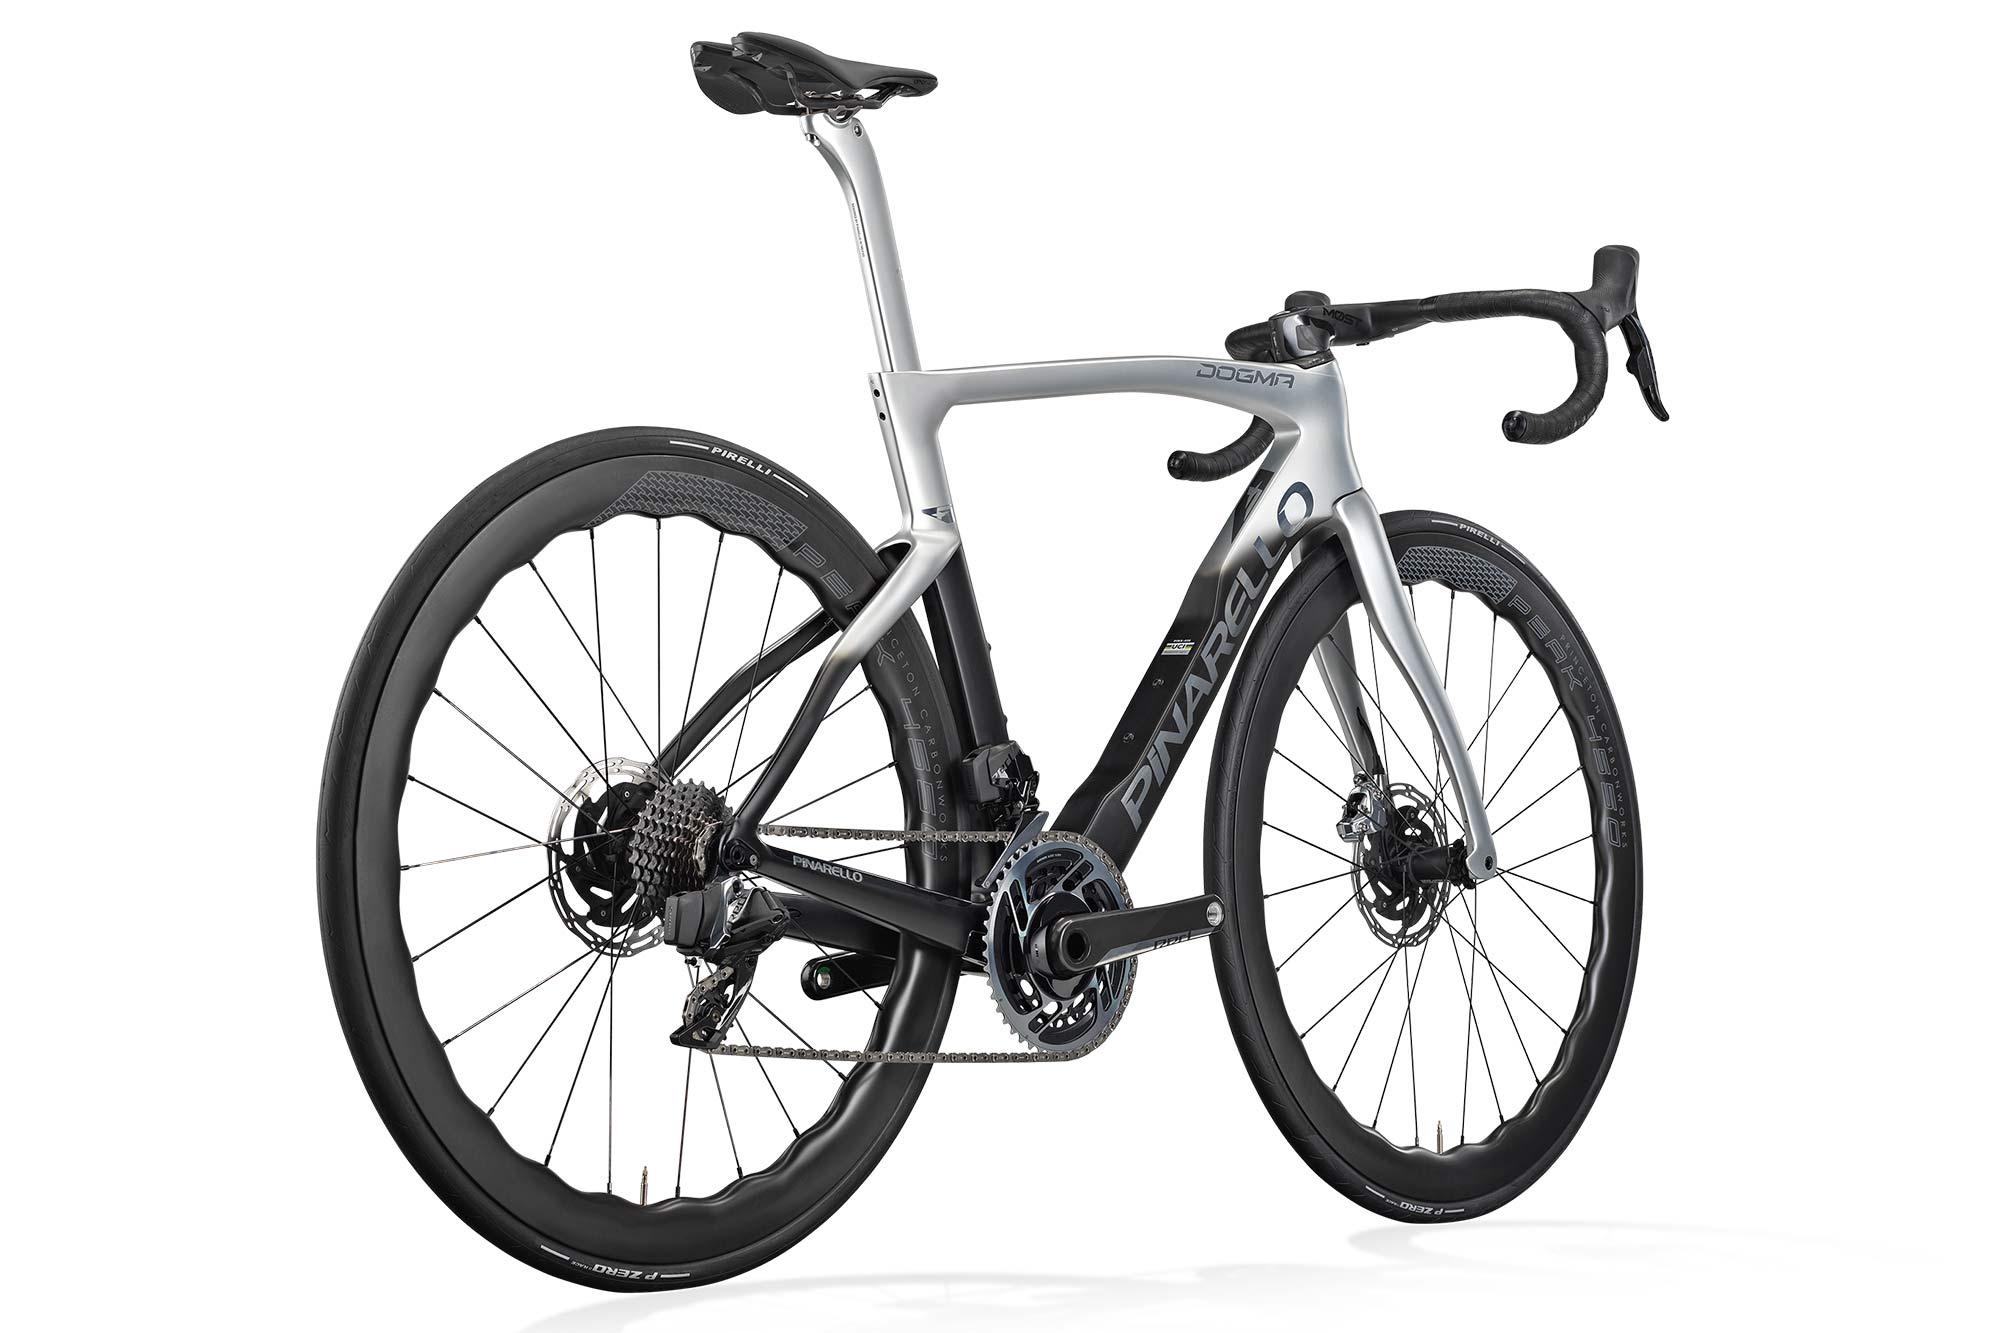 Princeton CarbonWorks Peak 4550 Launch Edition lightweight carbon aero road wheels,Pinarello Dogma F